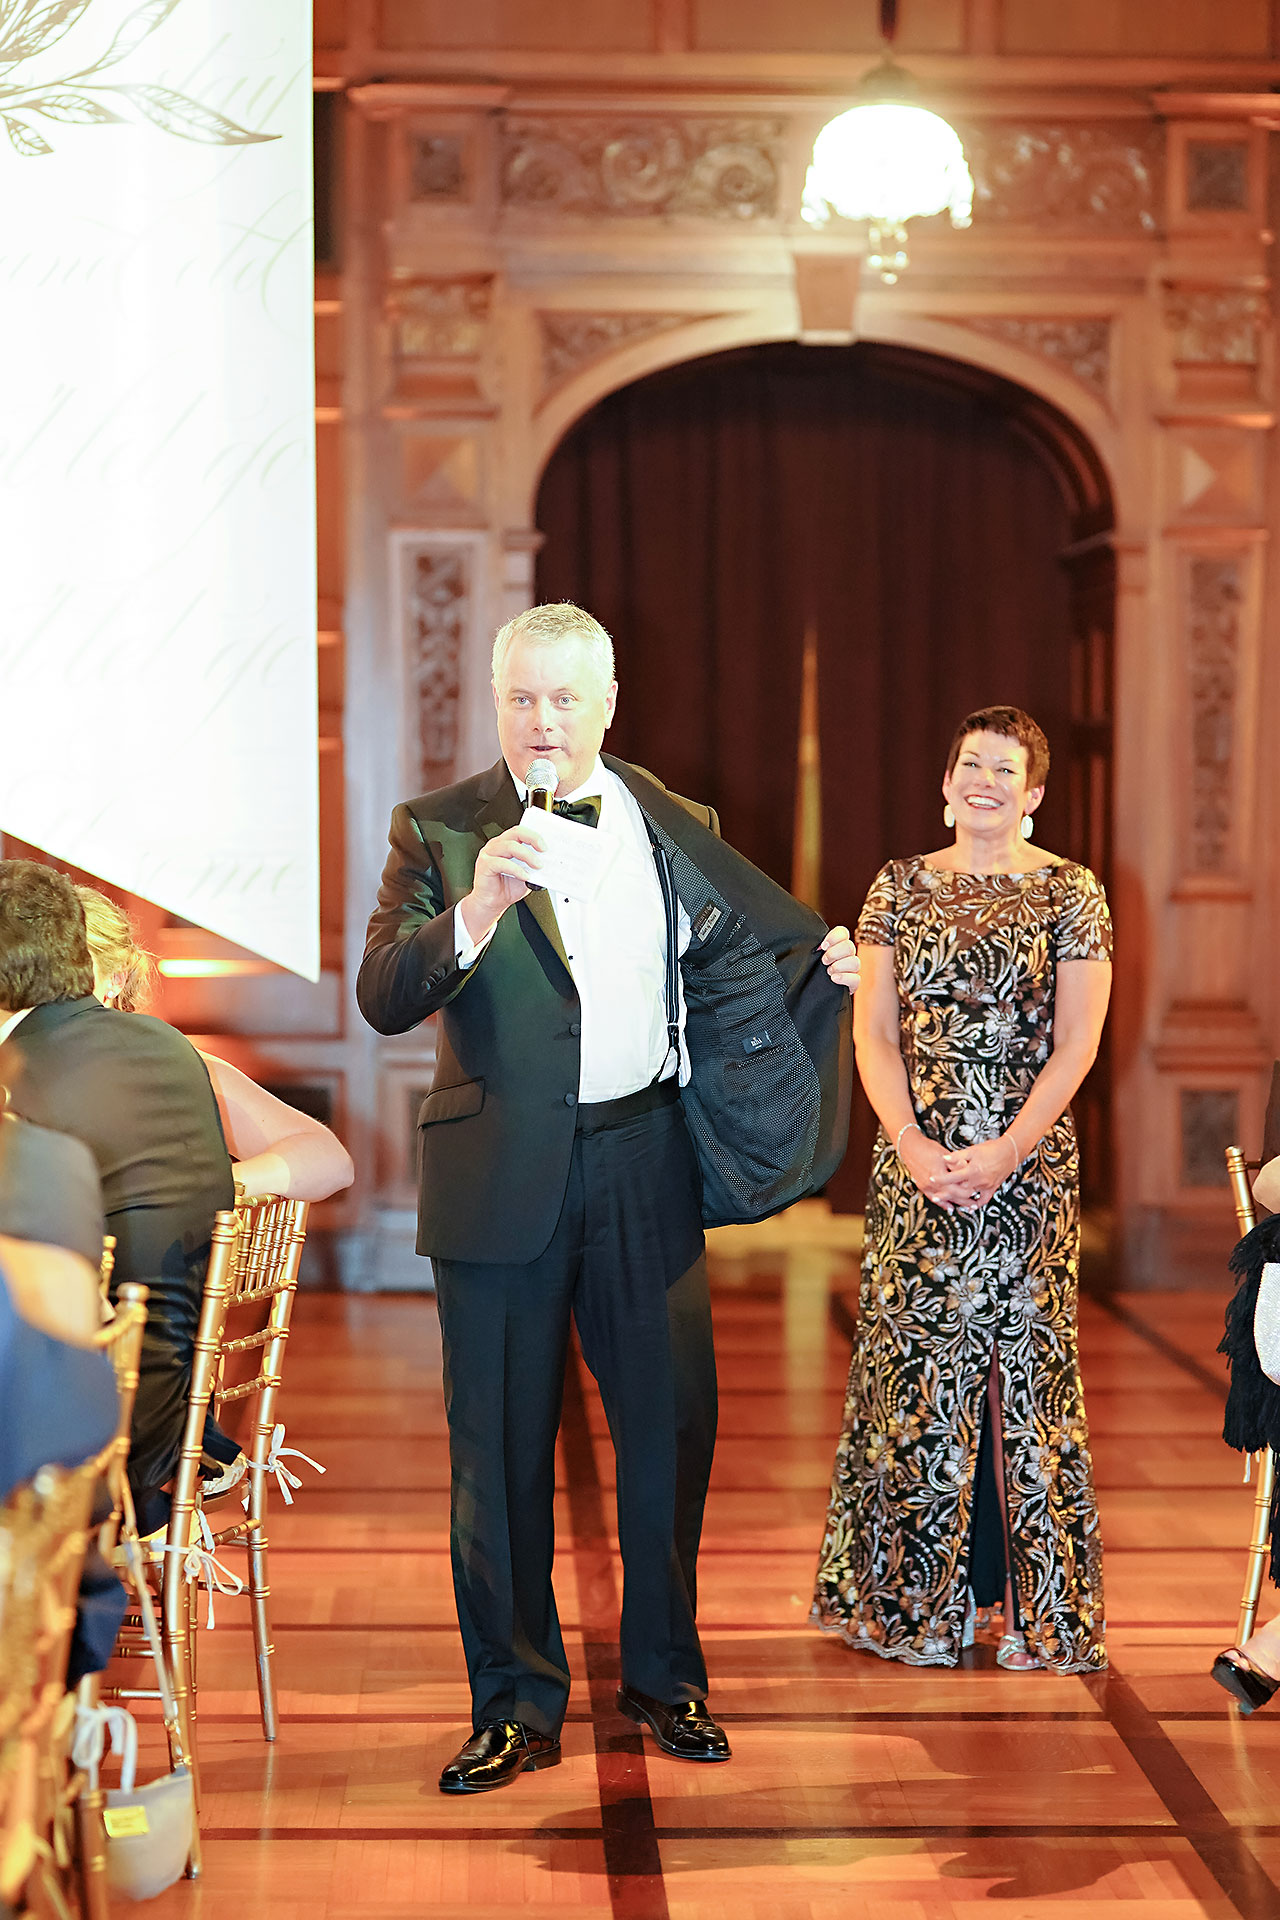 Erin Grant Indianapolis Central Library Scottish Rite Wedding 300